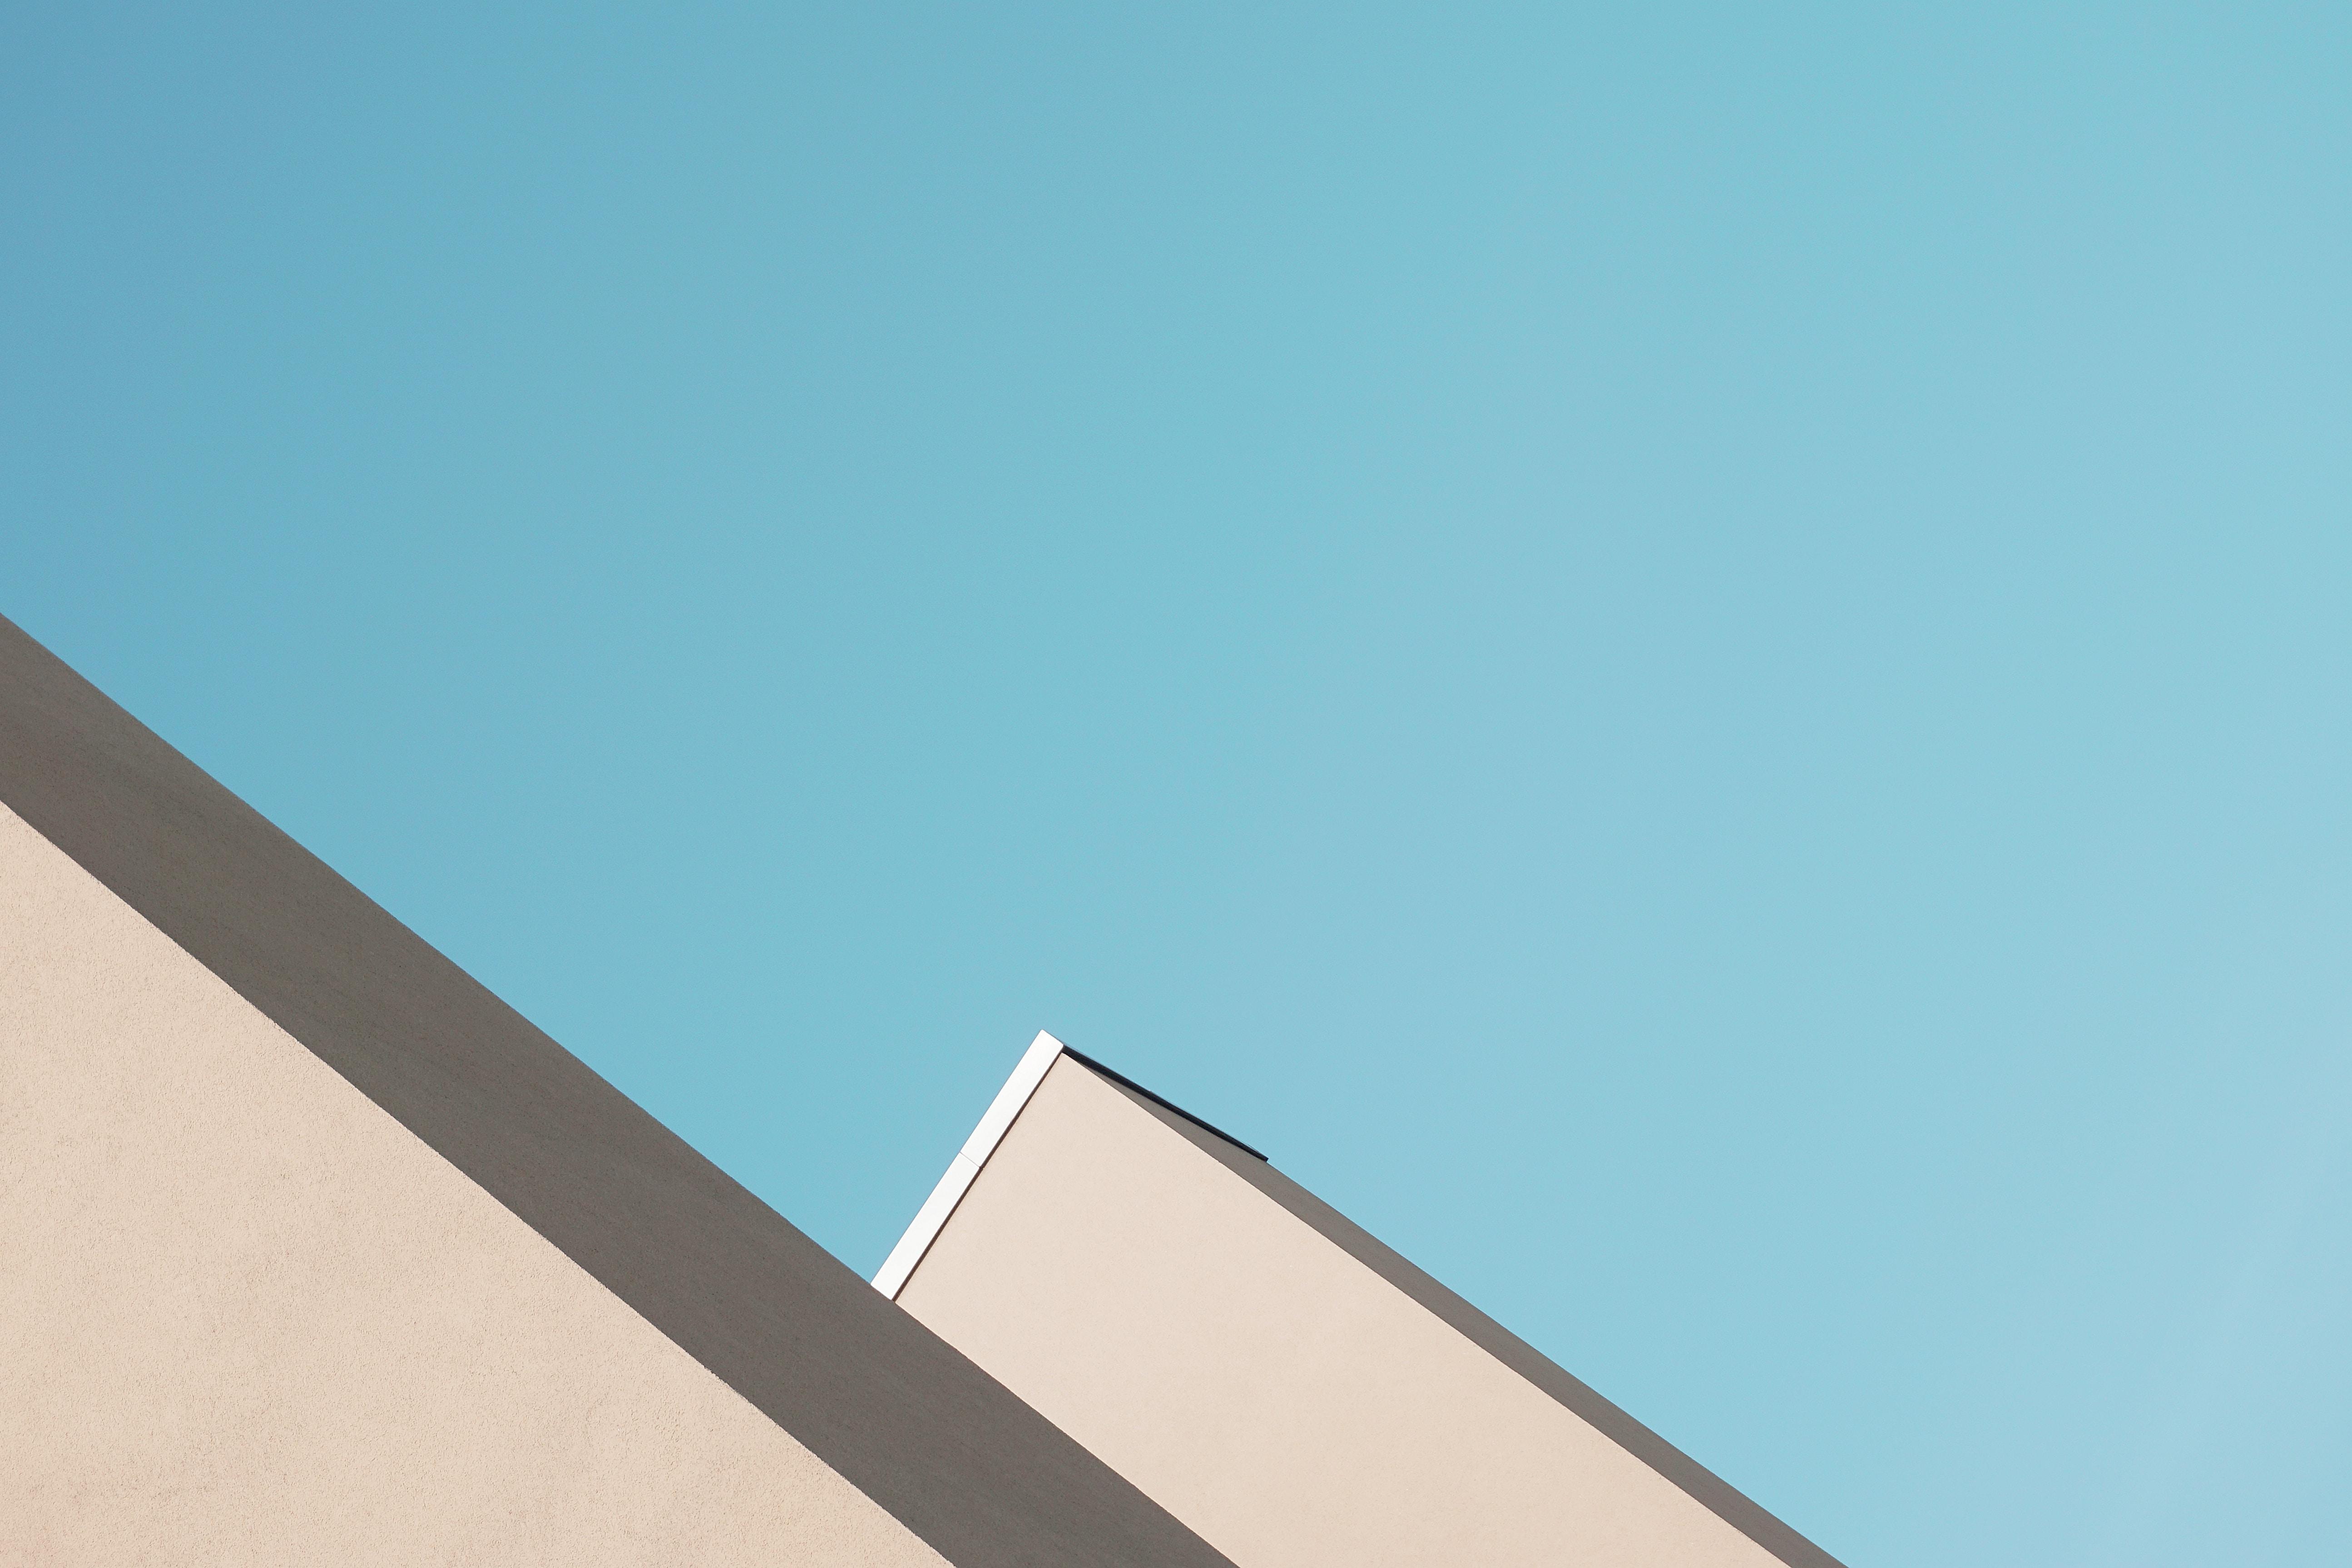 beige painted building under blue sky